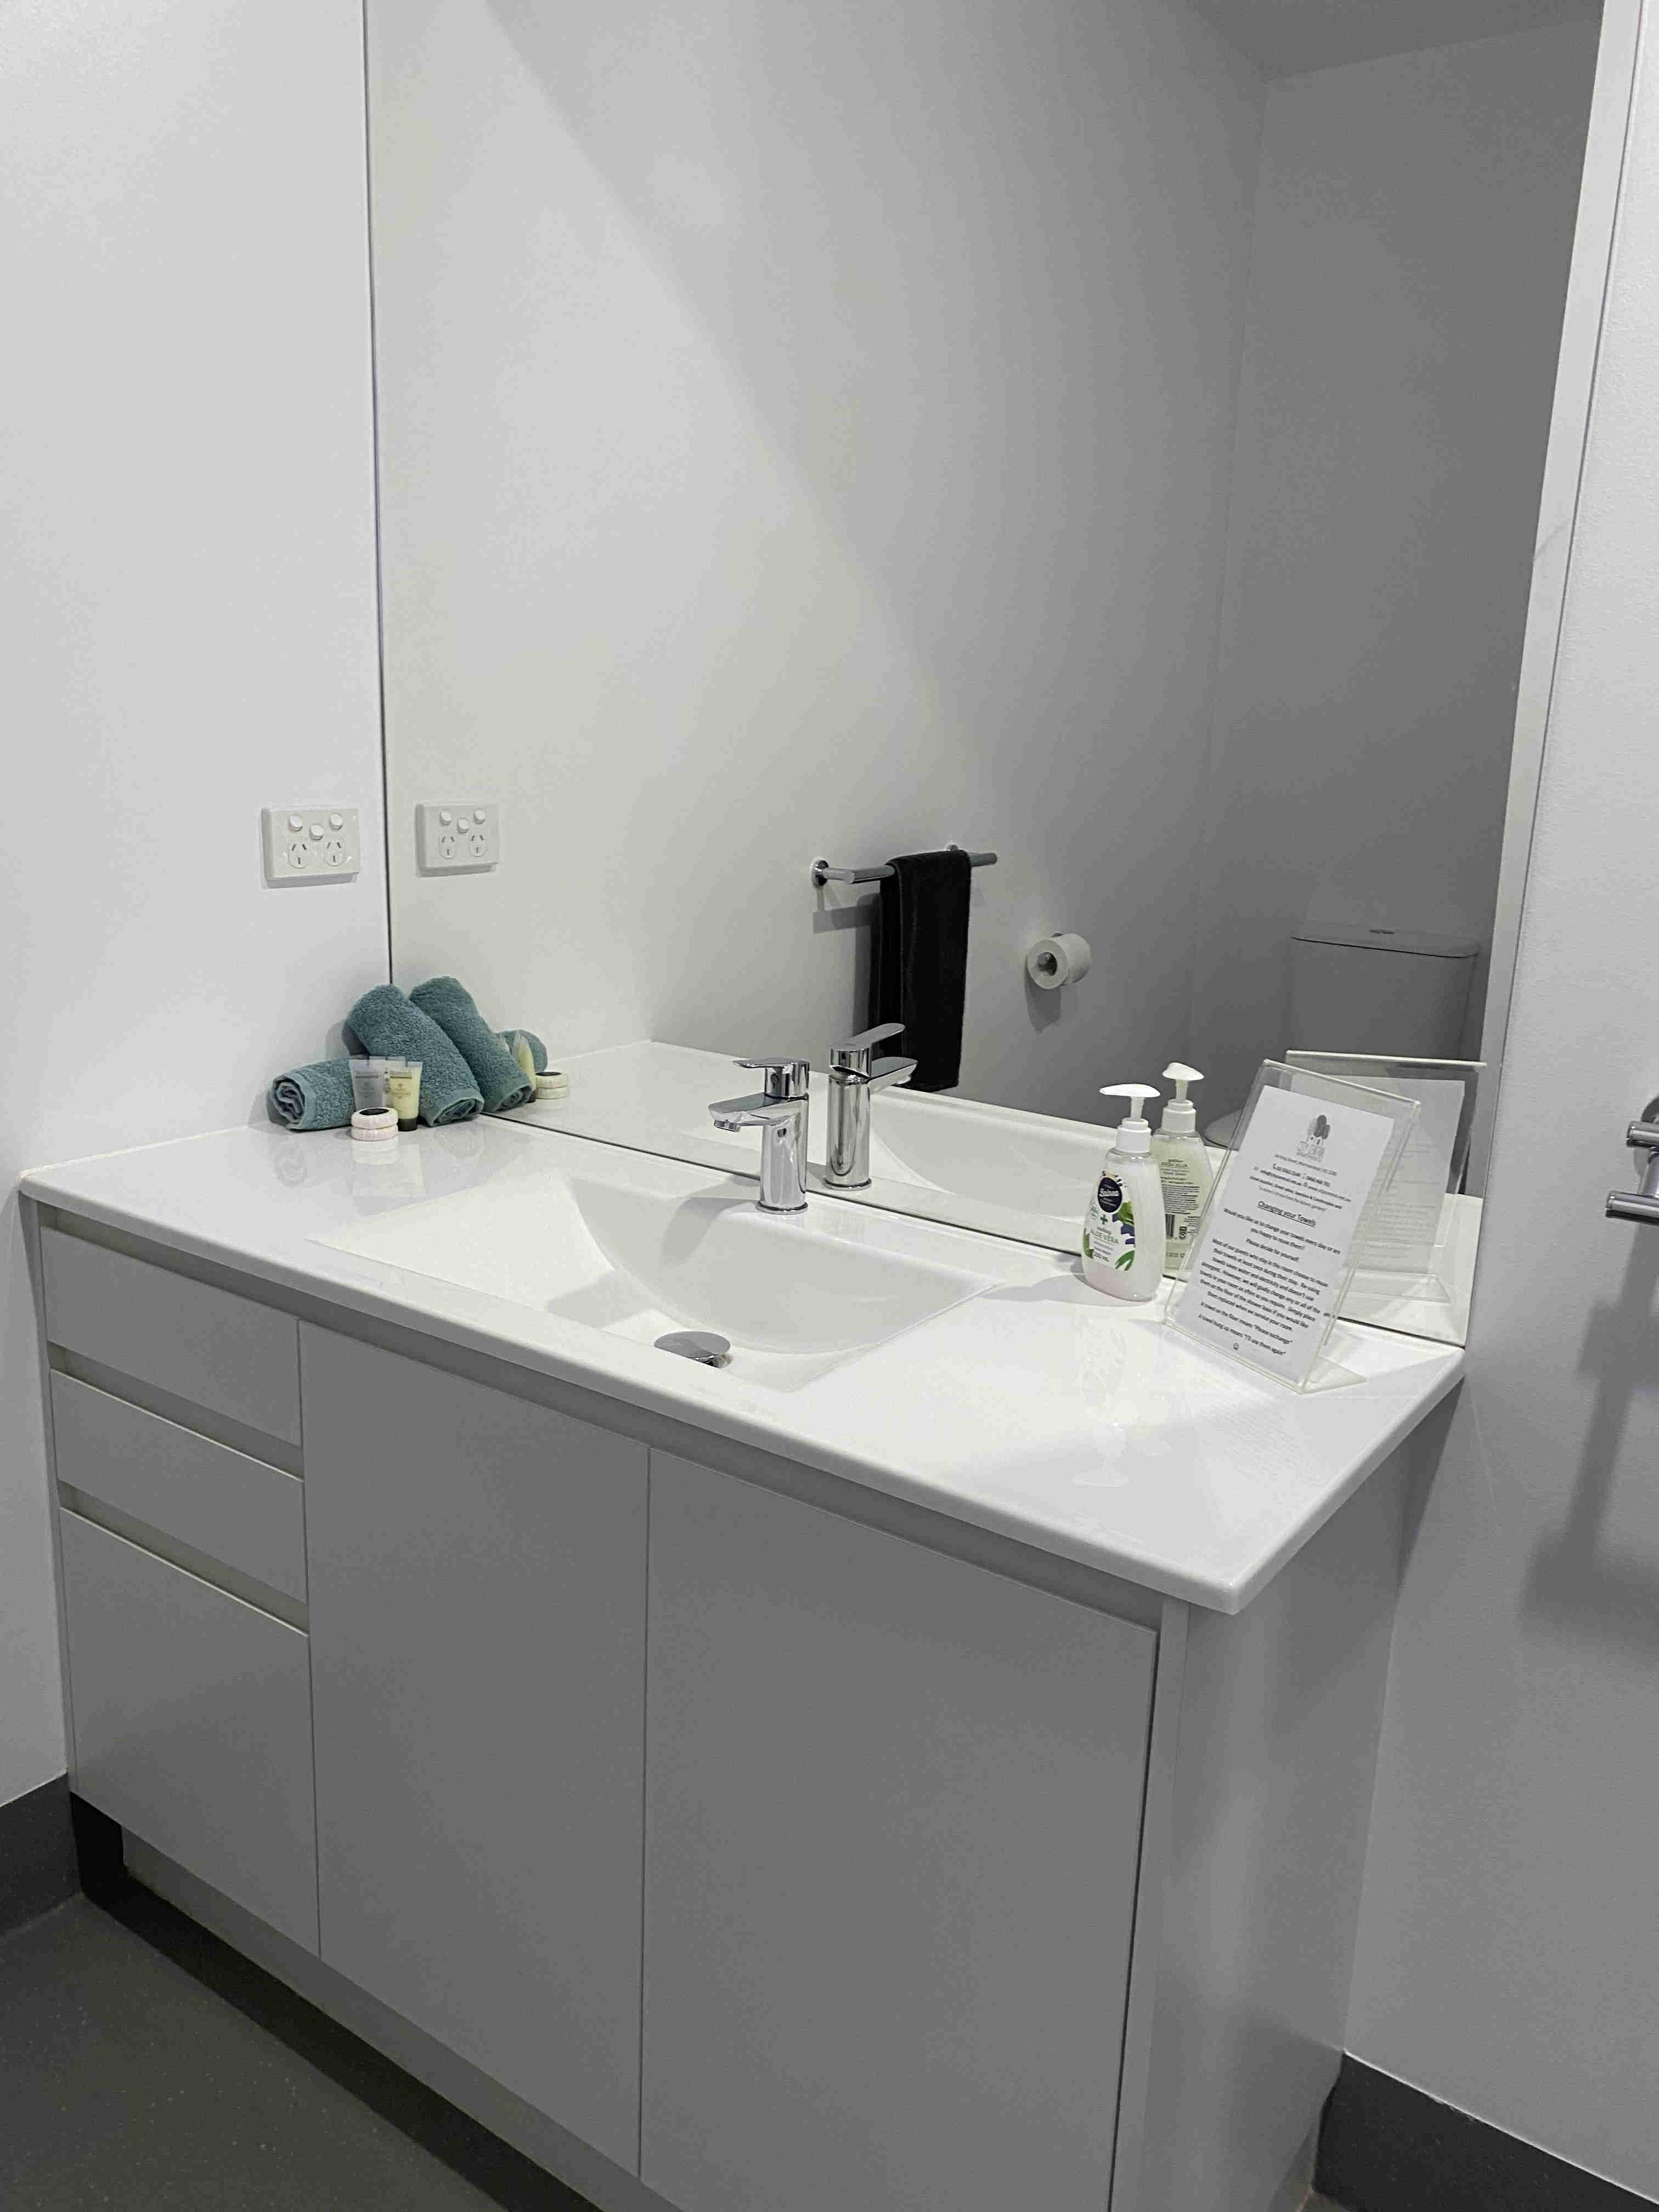 Vanity in bathroom of small studio apartment